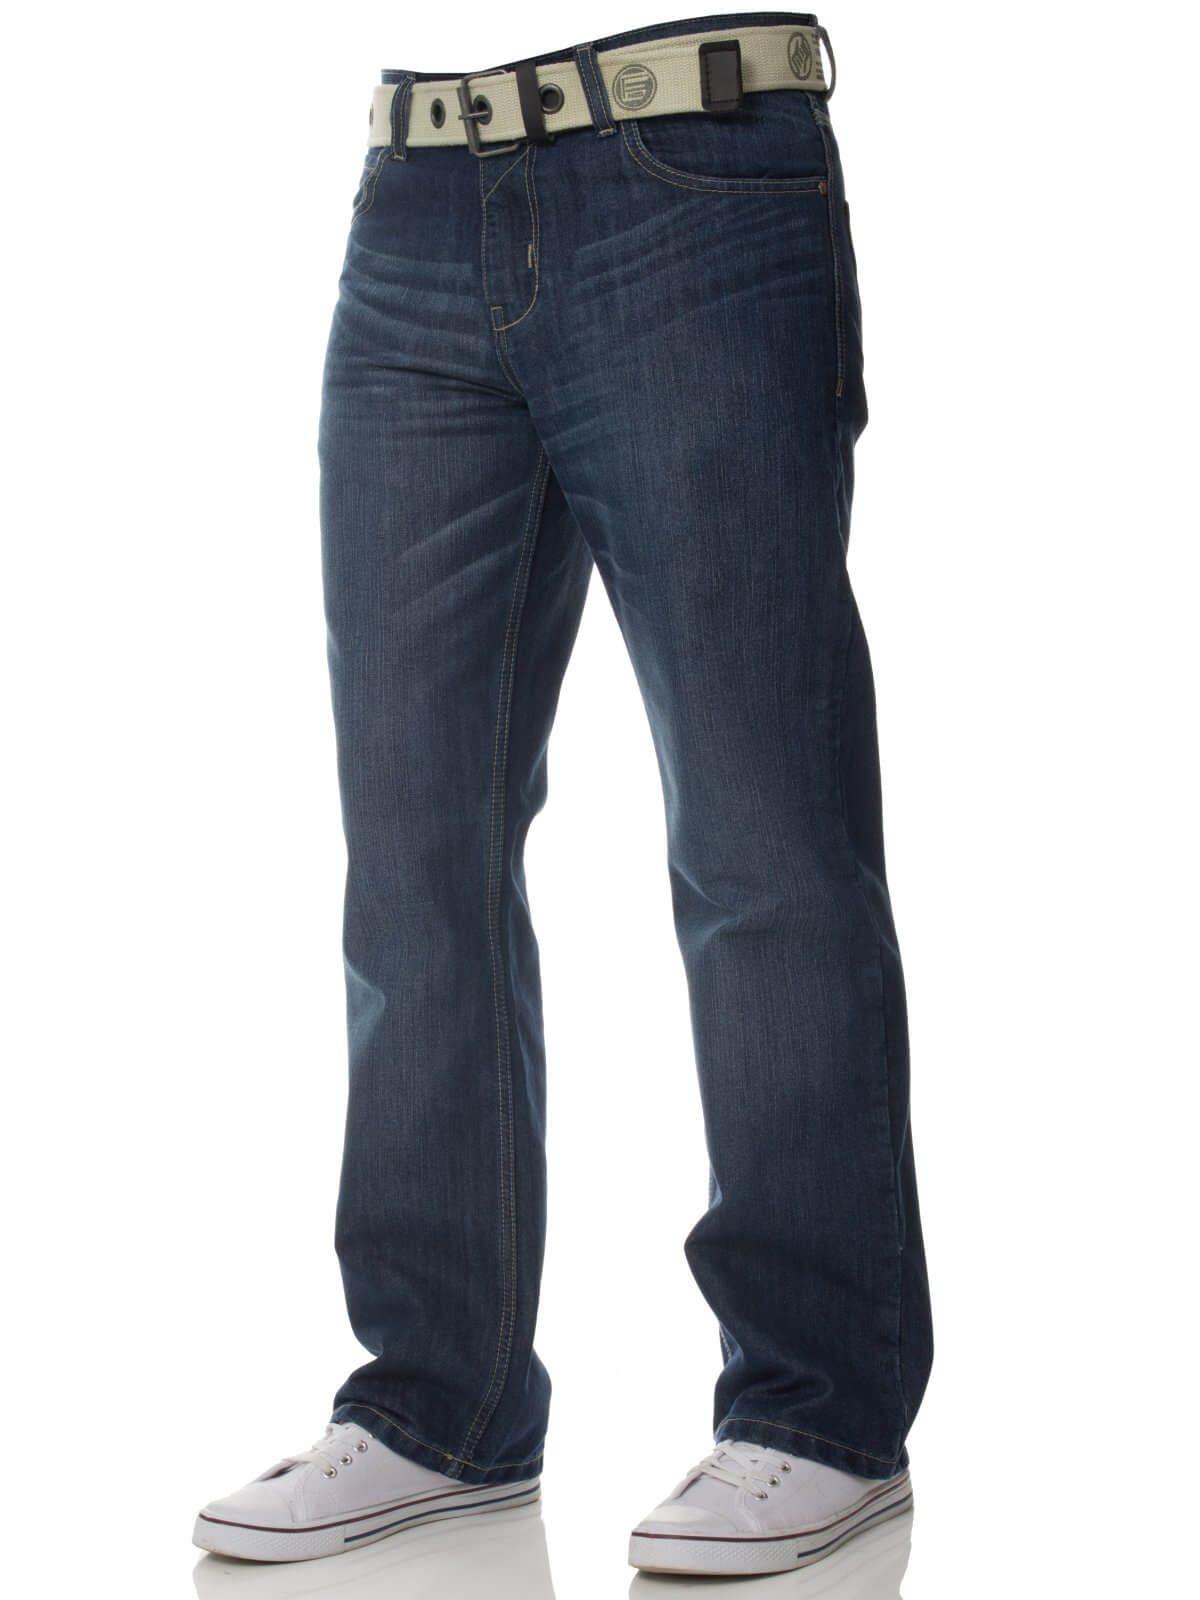 Mens Mid Wash Jeans with Belt EZ15 | Enzo Designer Menswear